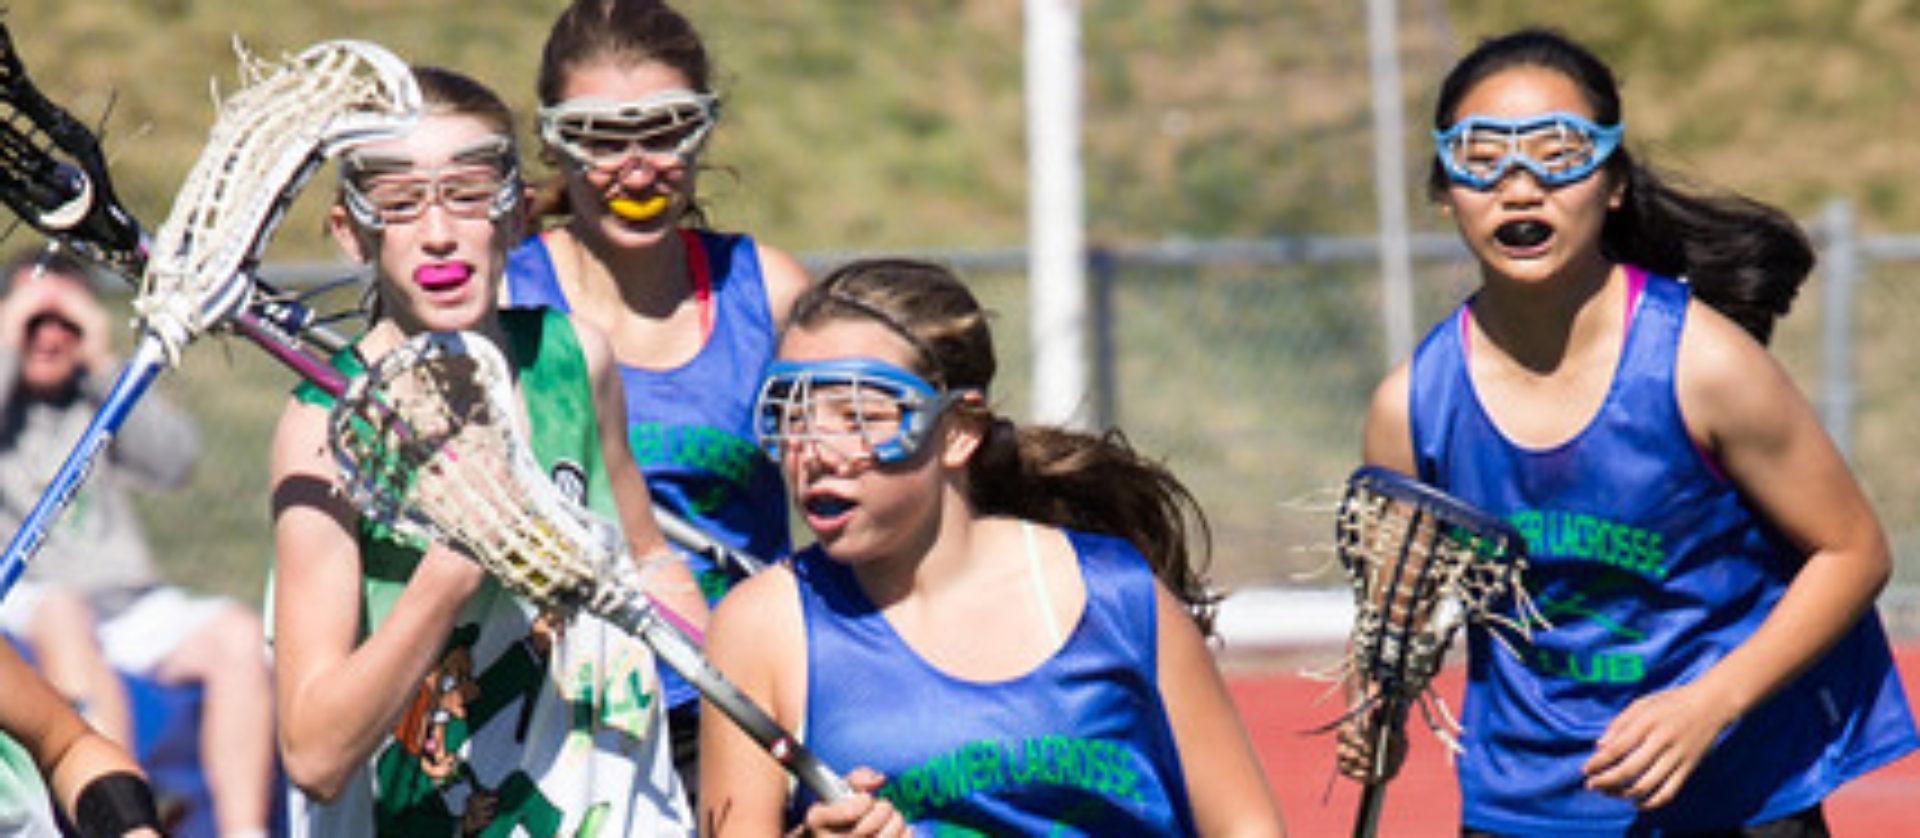 Empower Lacrosse Club